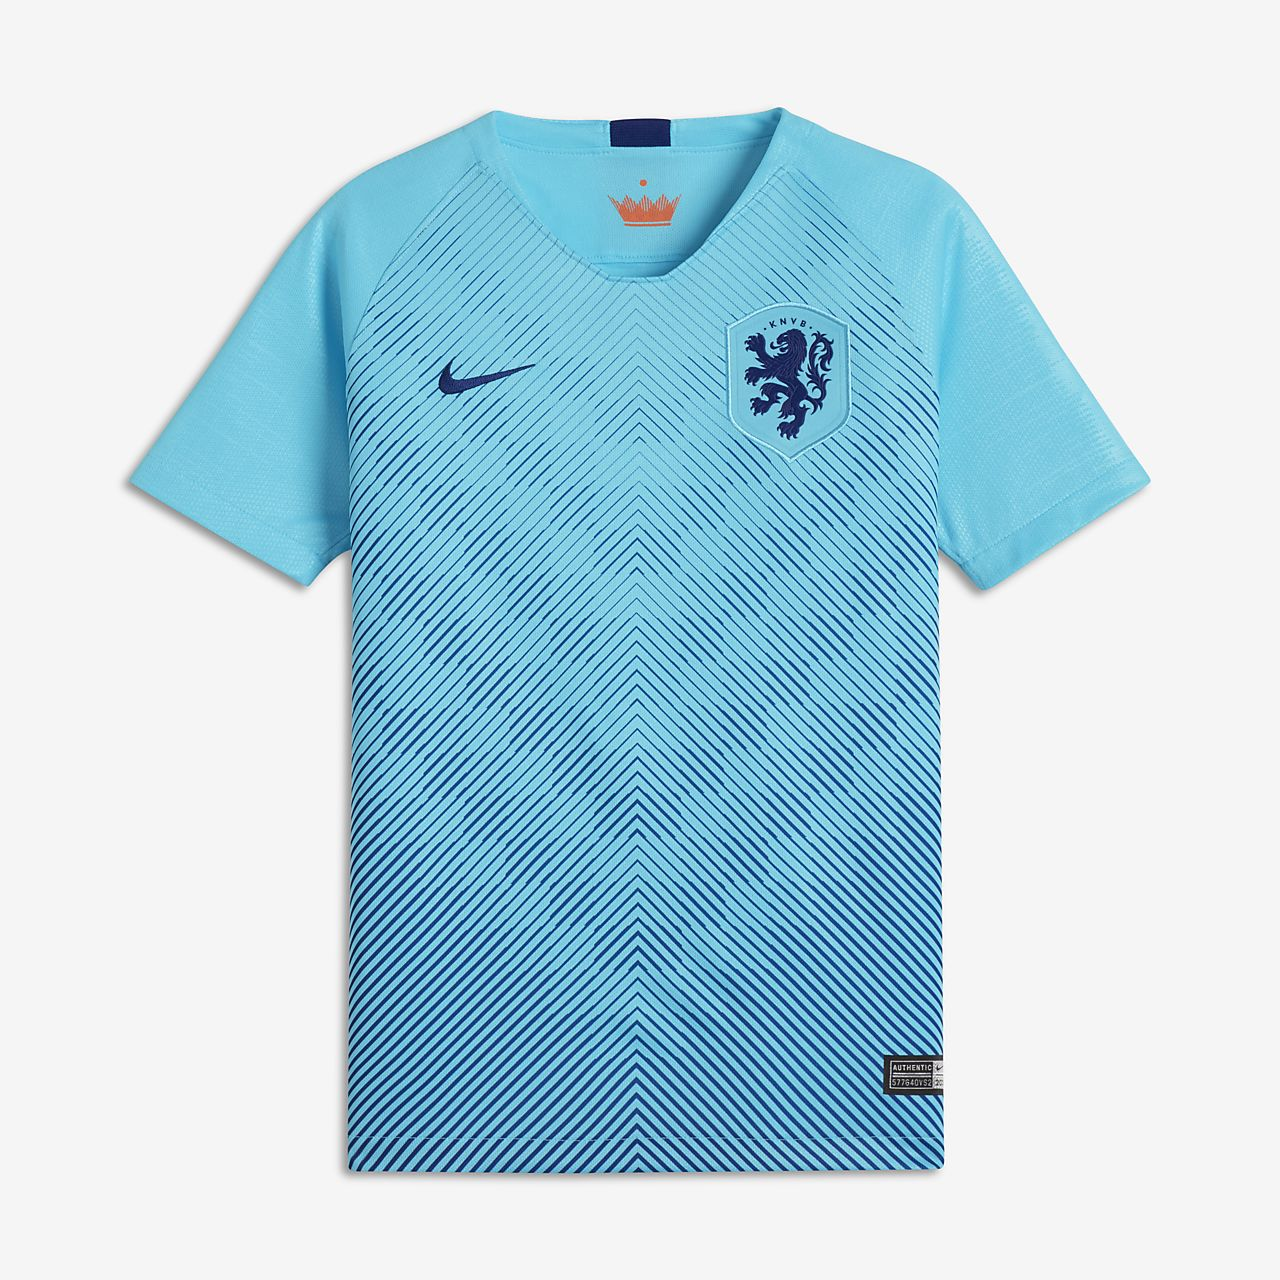 Maglia da calcio 2018 Netherlands Stadium Away - Ragazzi